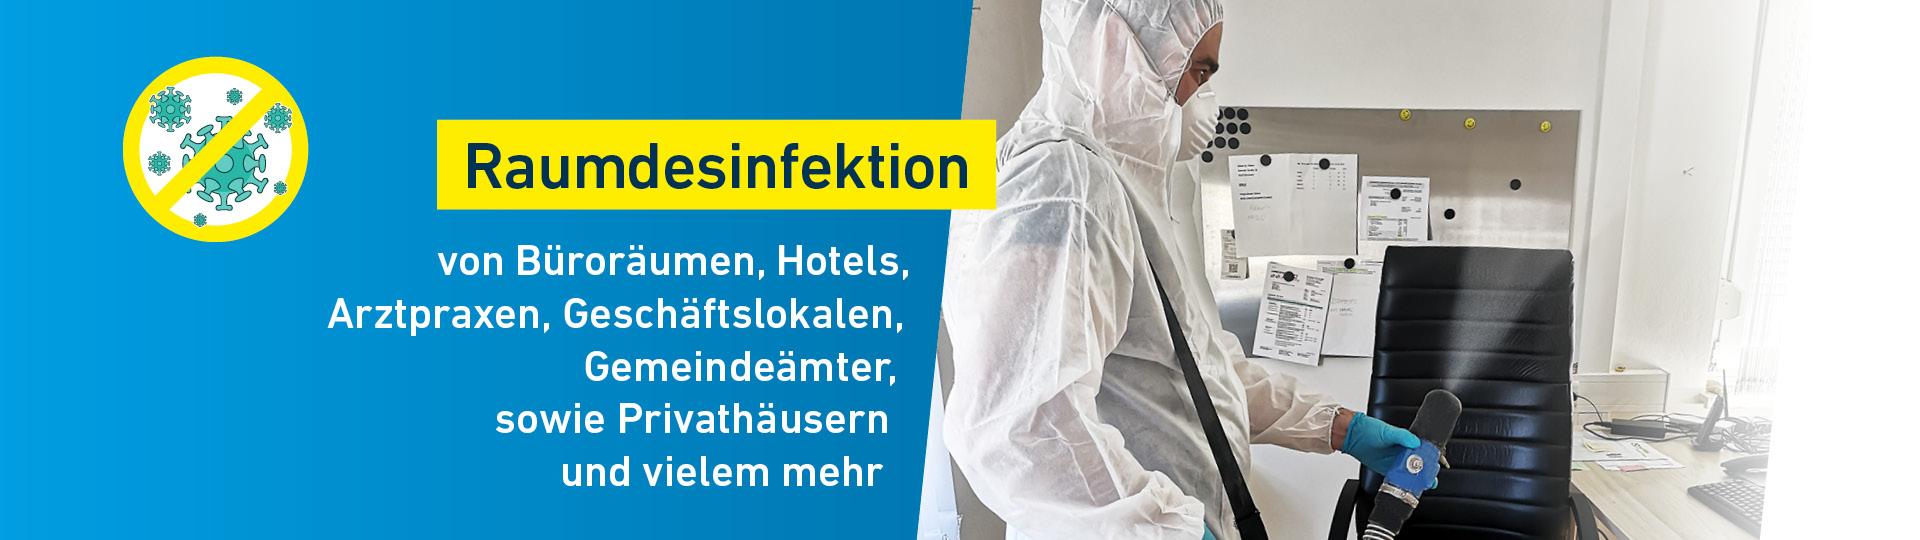 Profi Max - Raumdesinfektion